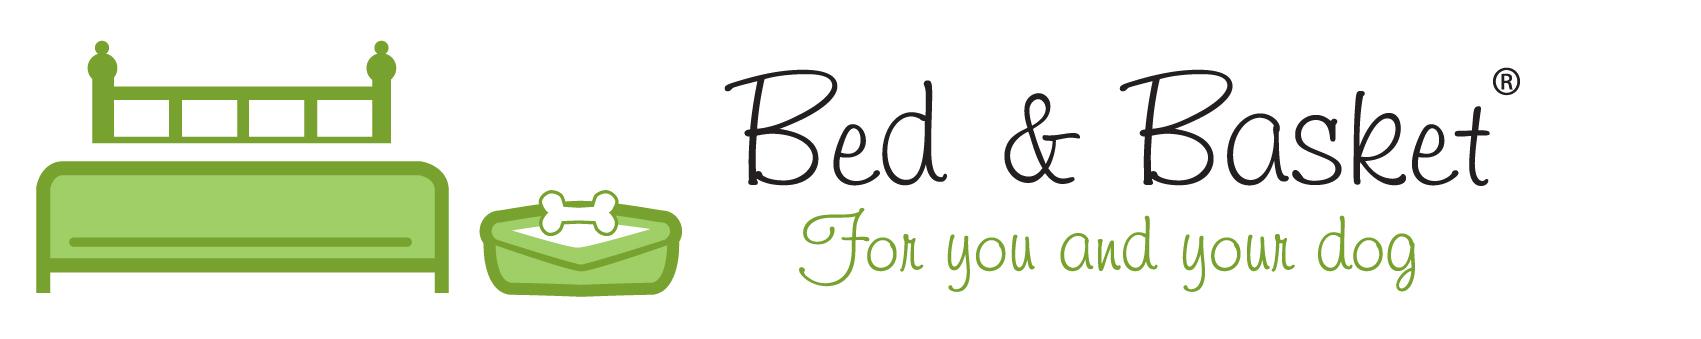 Bed and Basket logo